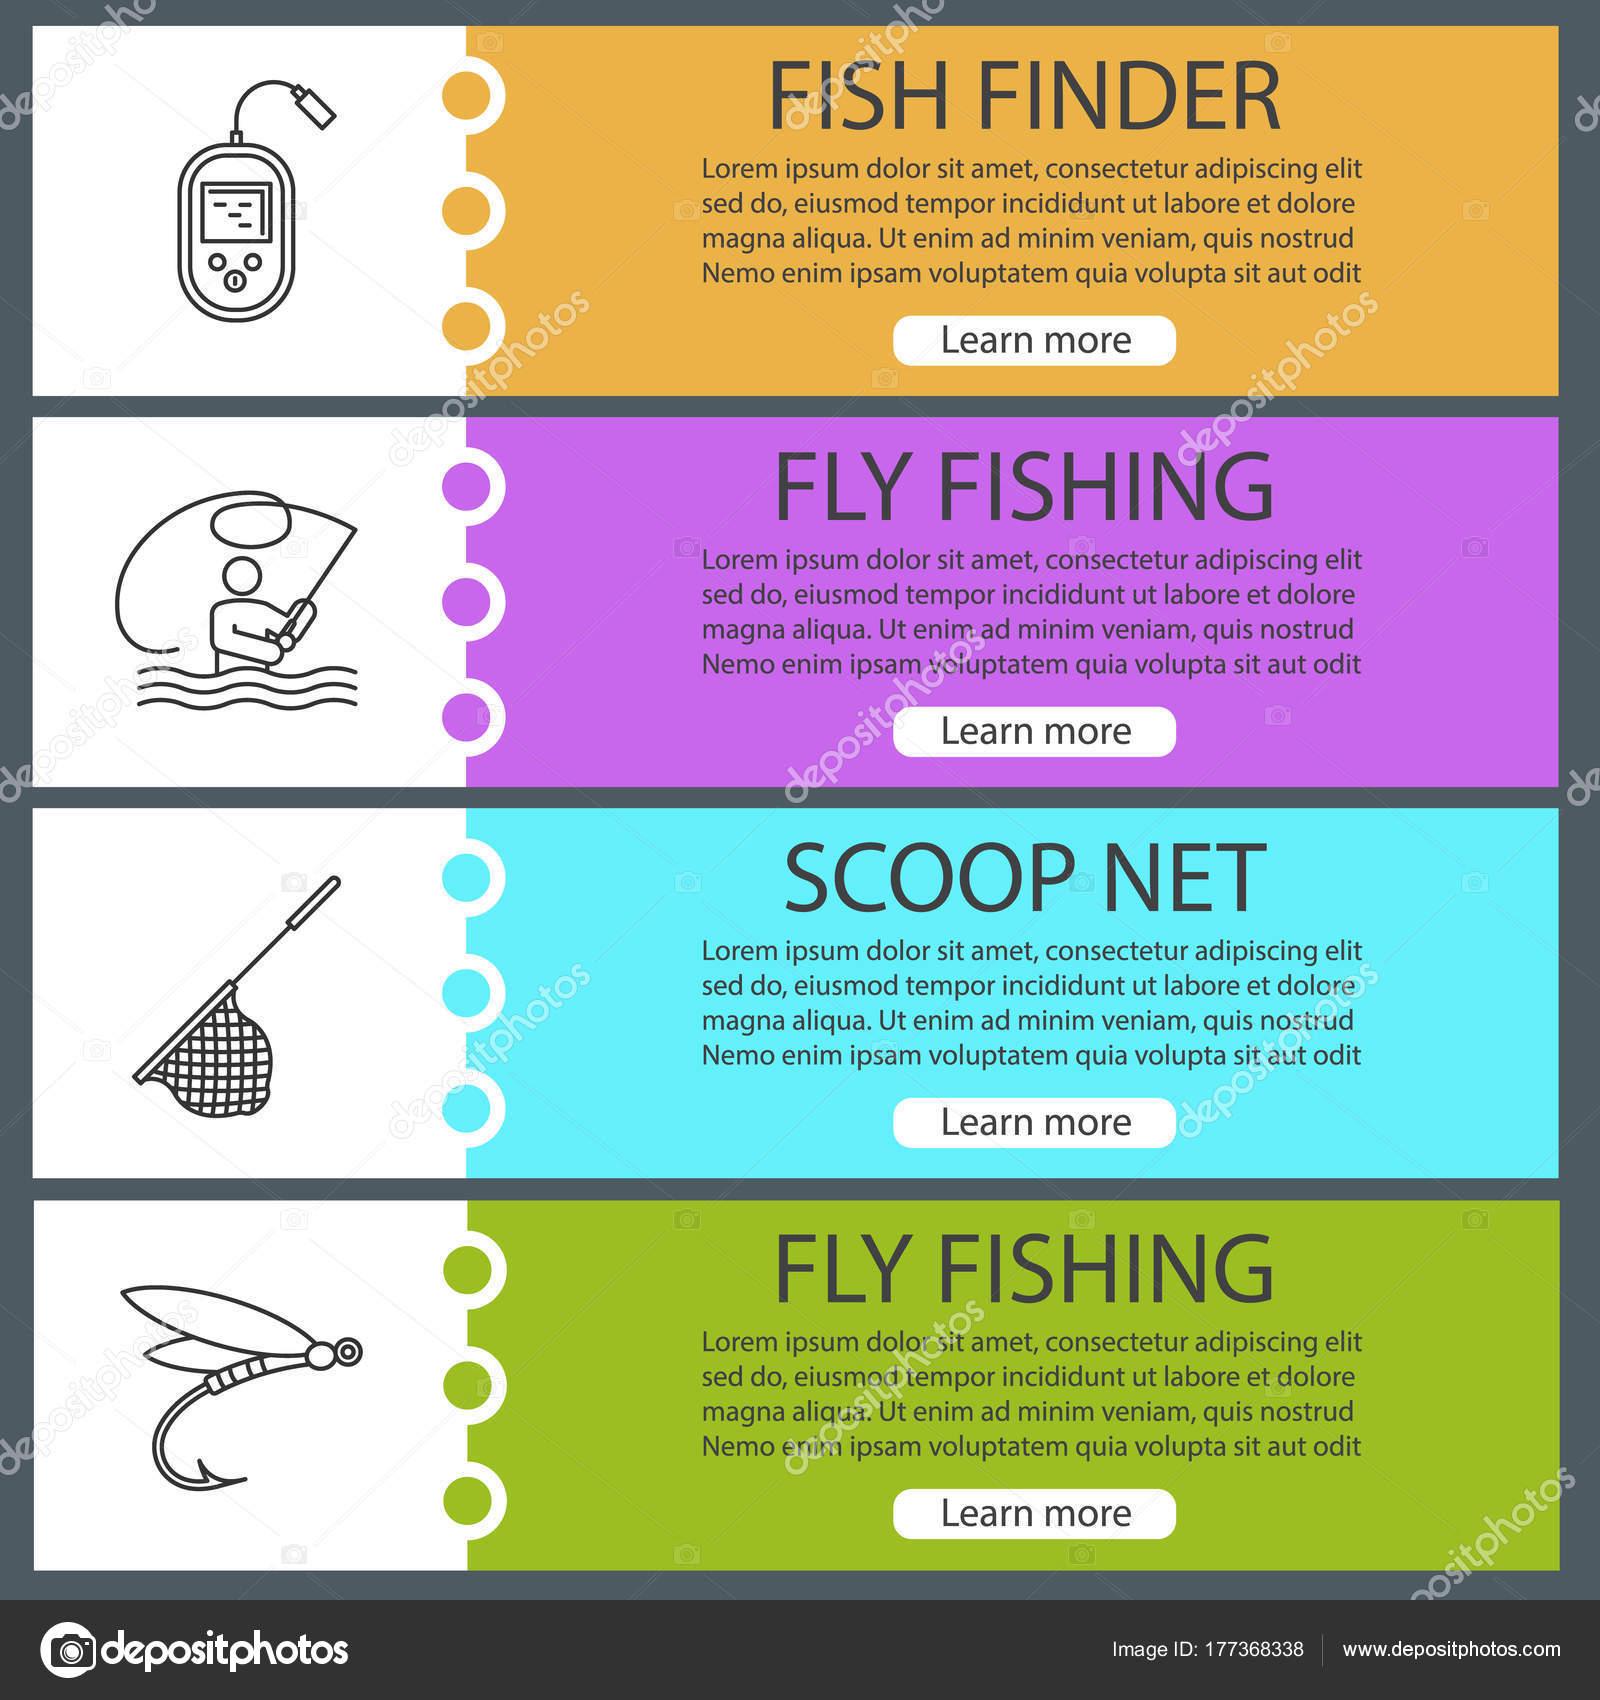 fishing web banner templates set fly fishing echo sounder landing